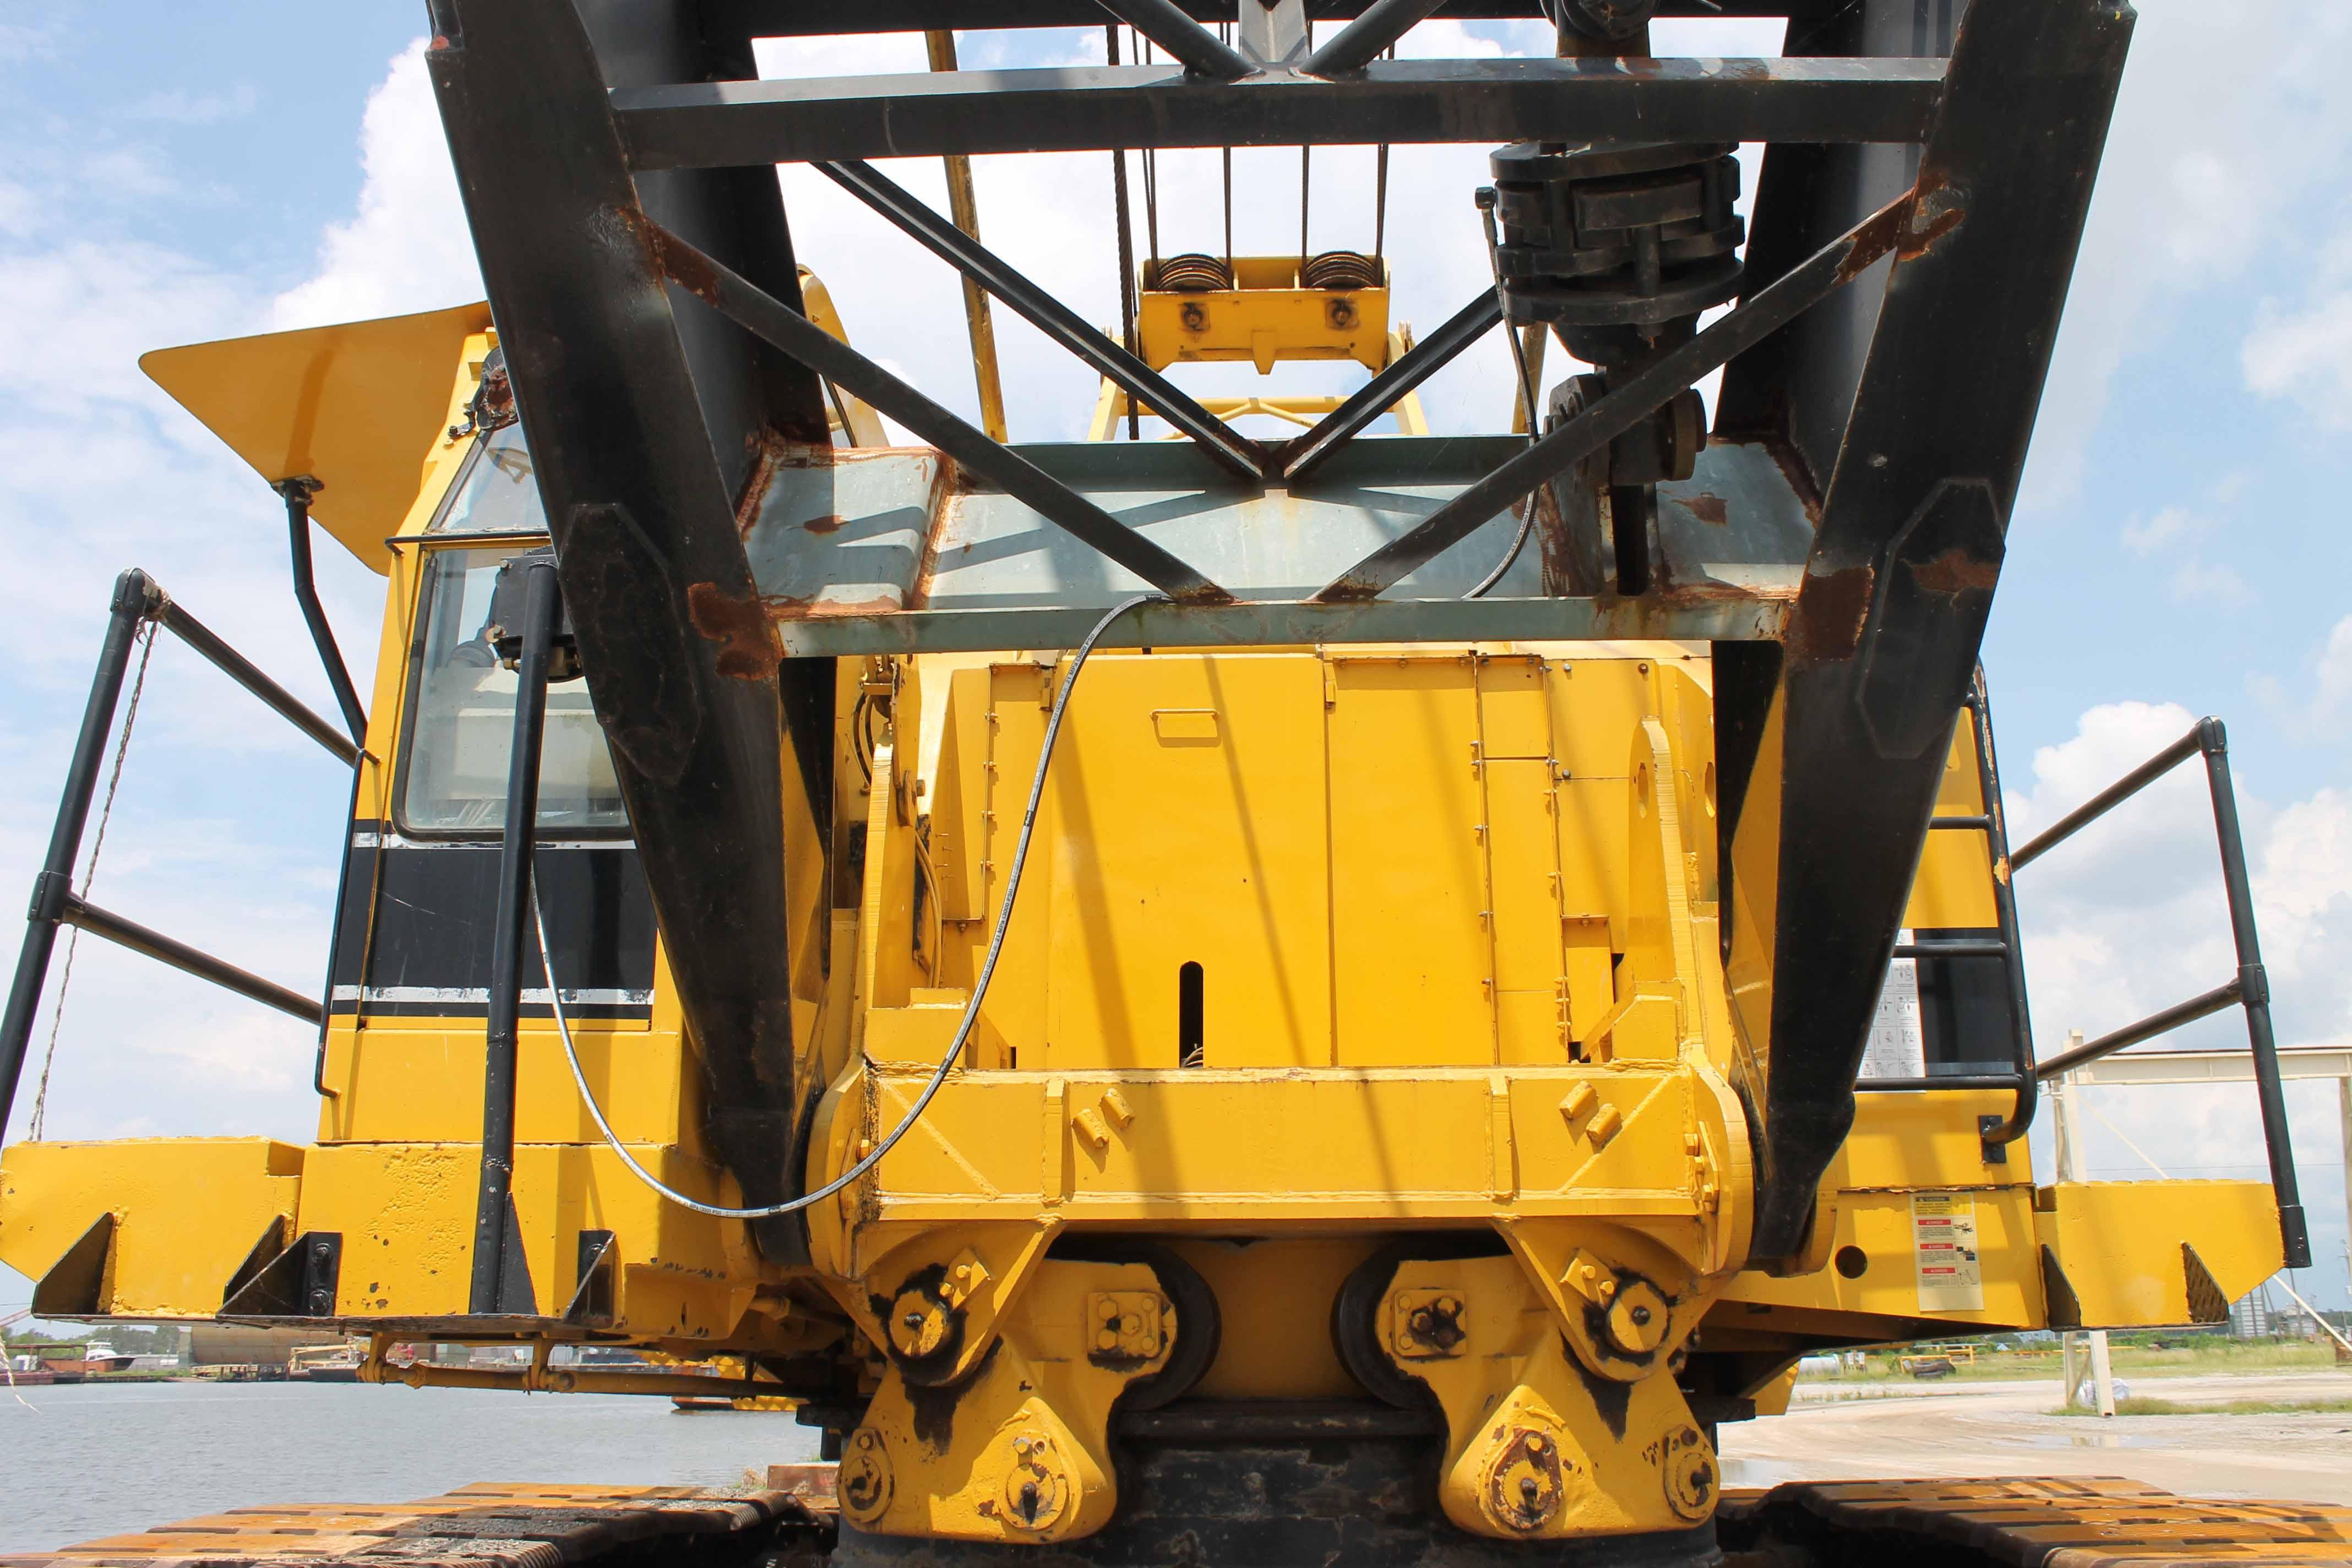 Lot 1 - Crawler Crane, American Model 9260, rebuilt 2014, 125 ton cap., approx. 50' boom, S/N GS18128